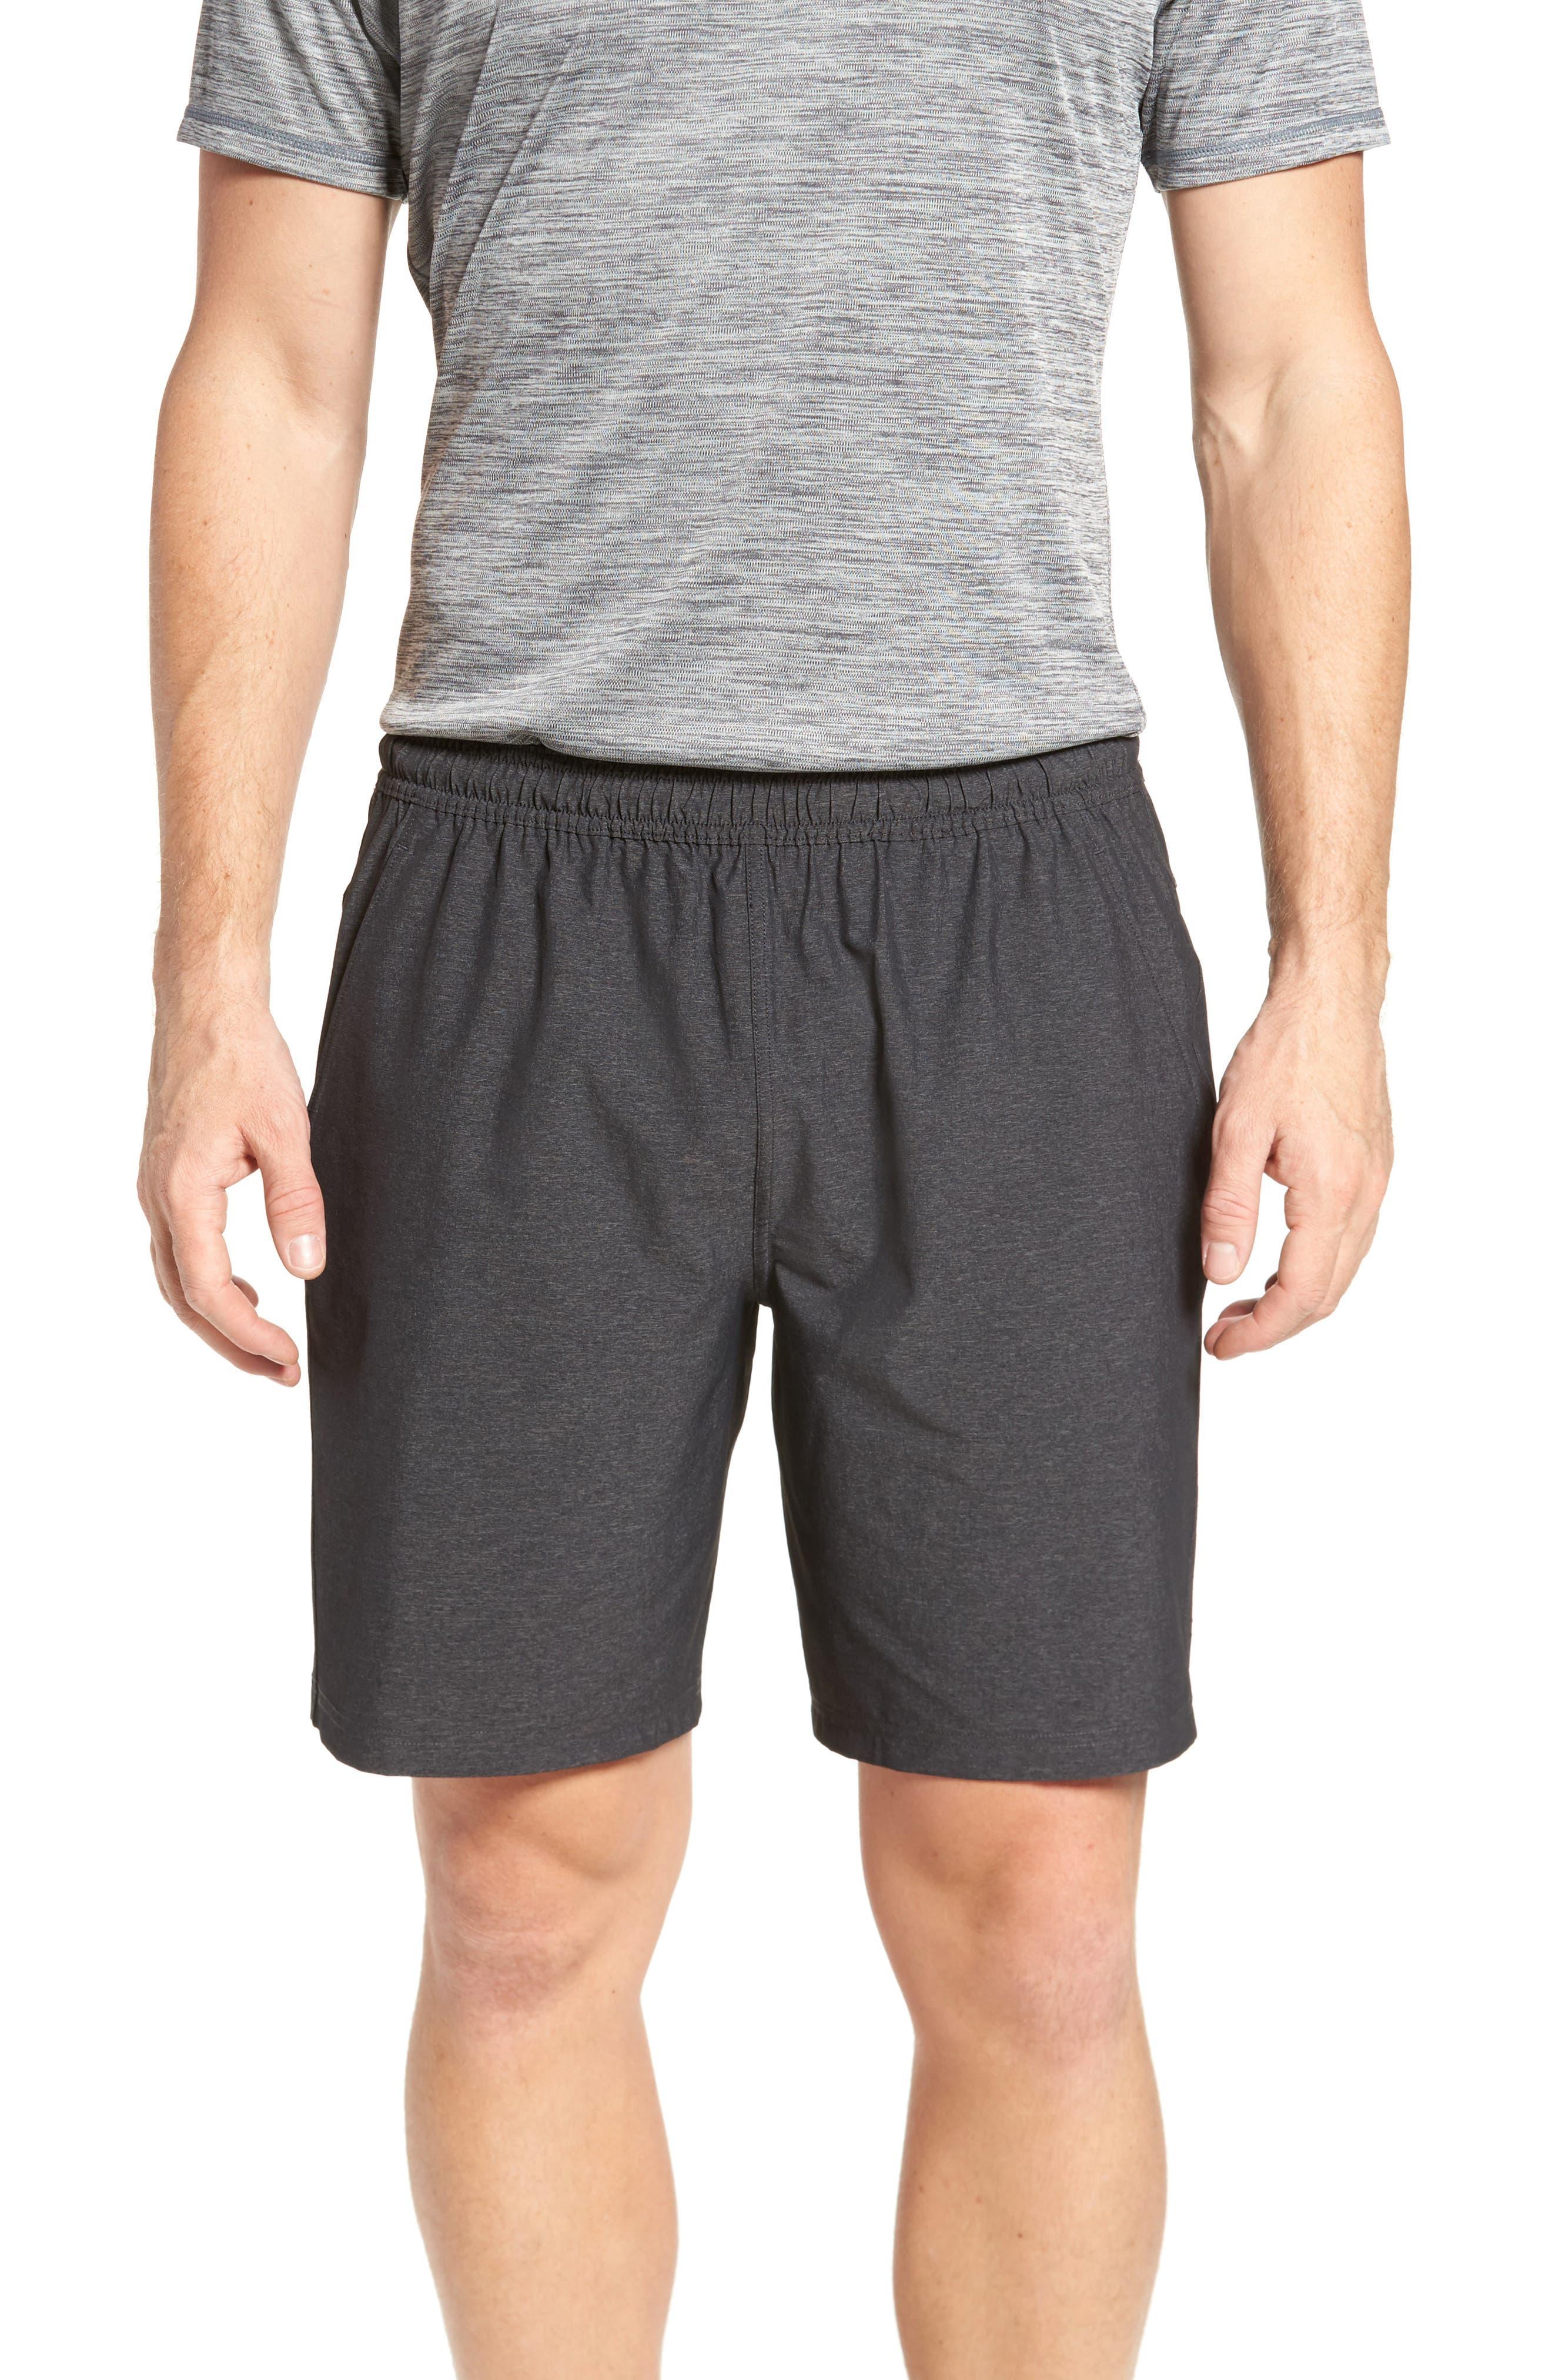 Graphite Shorts,                         Main,                         color,